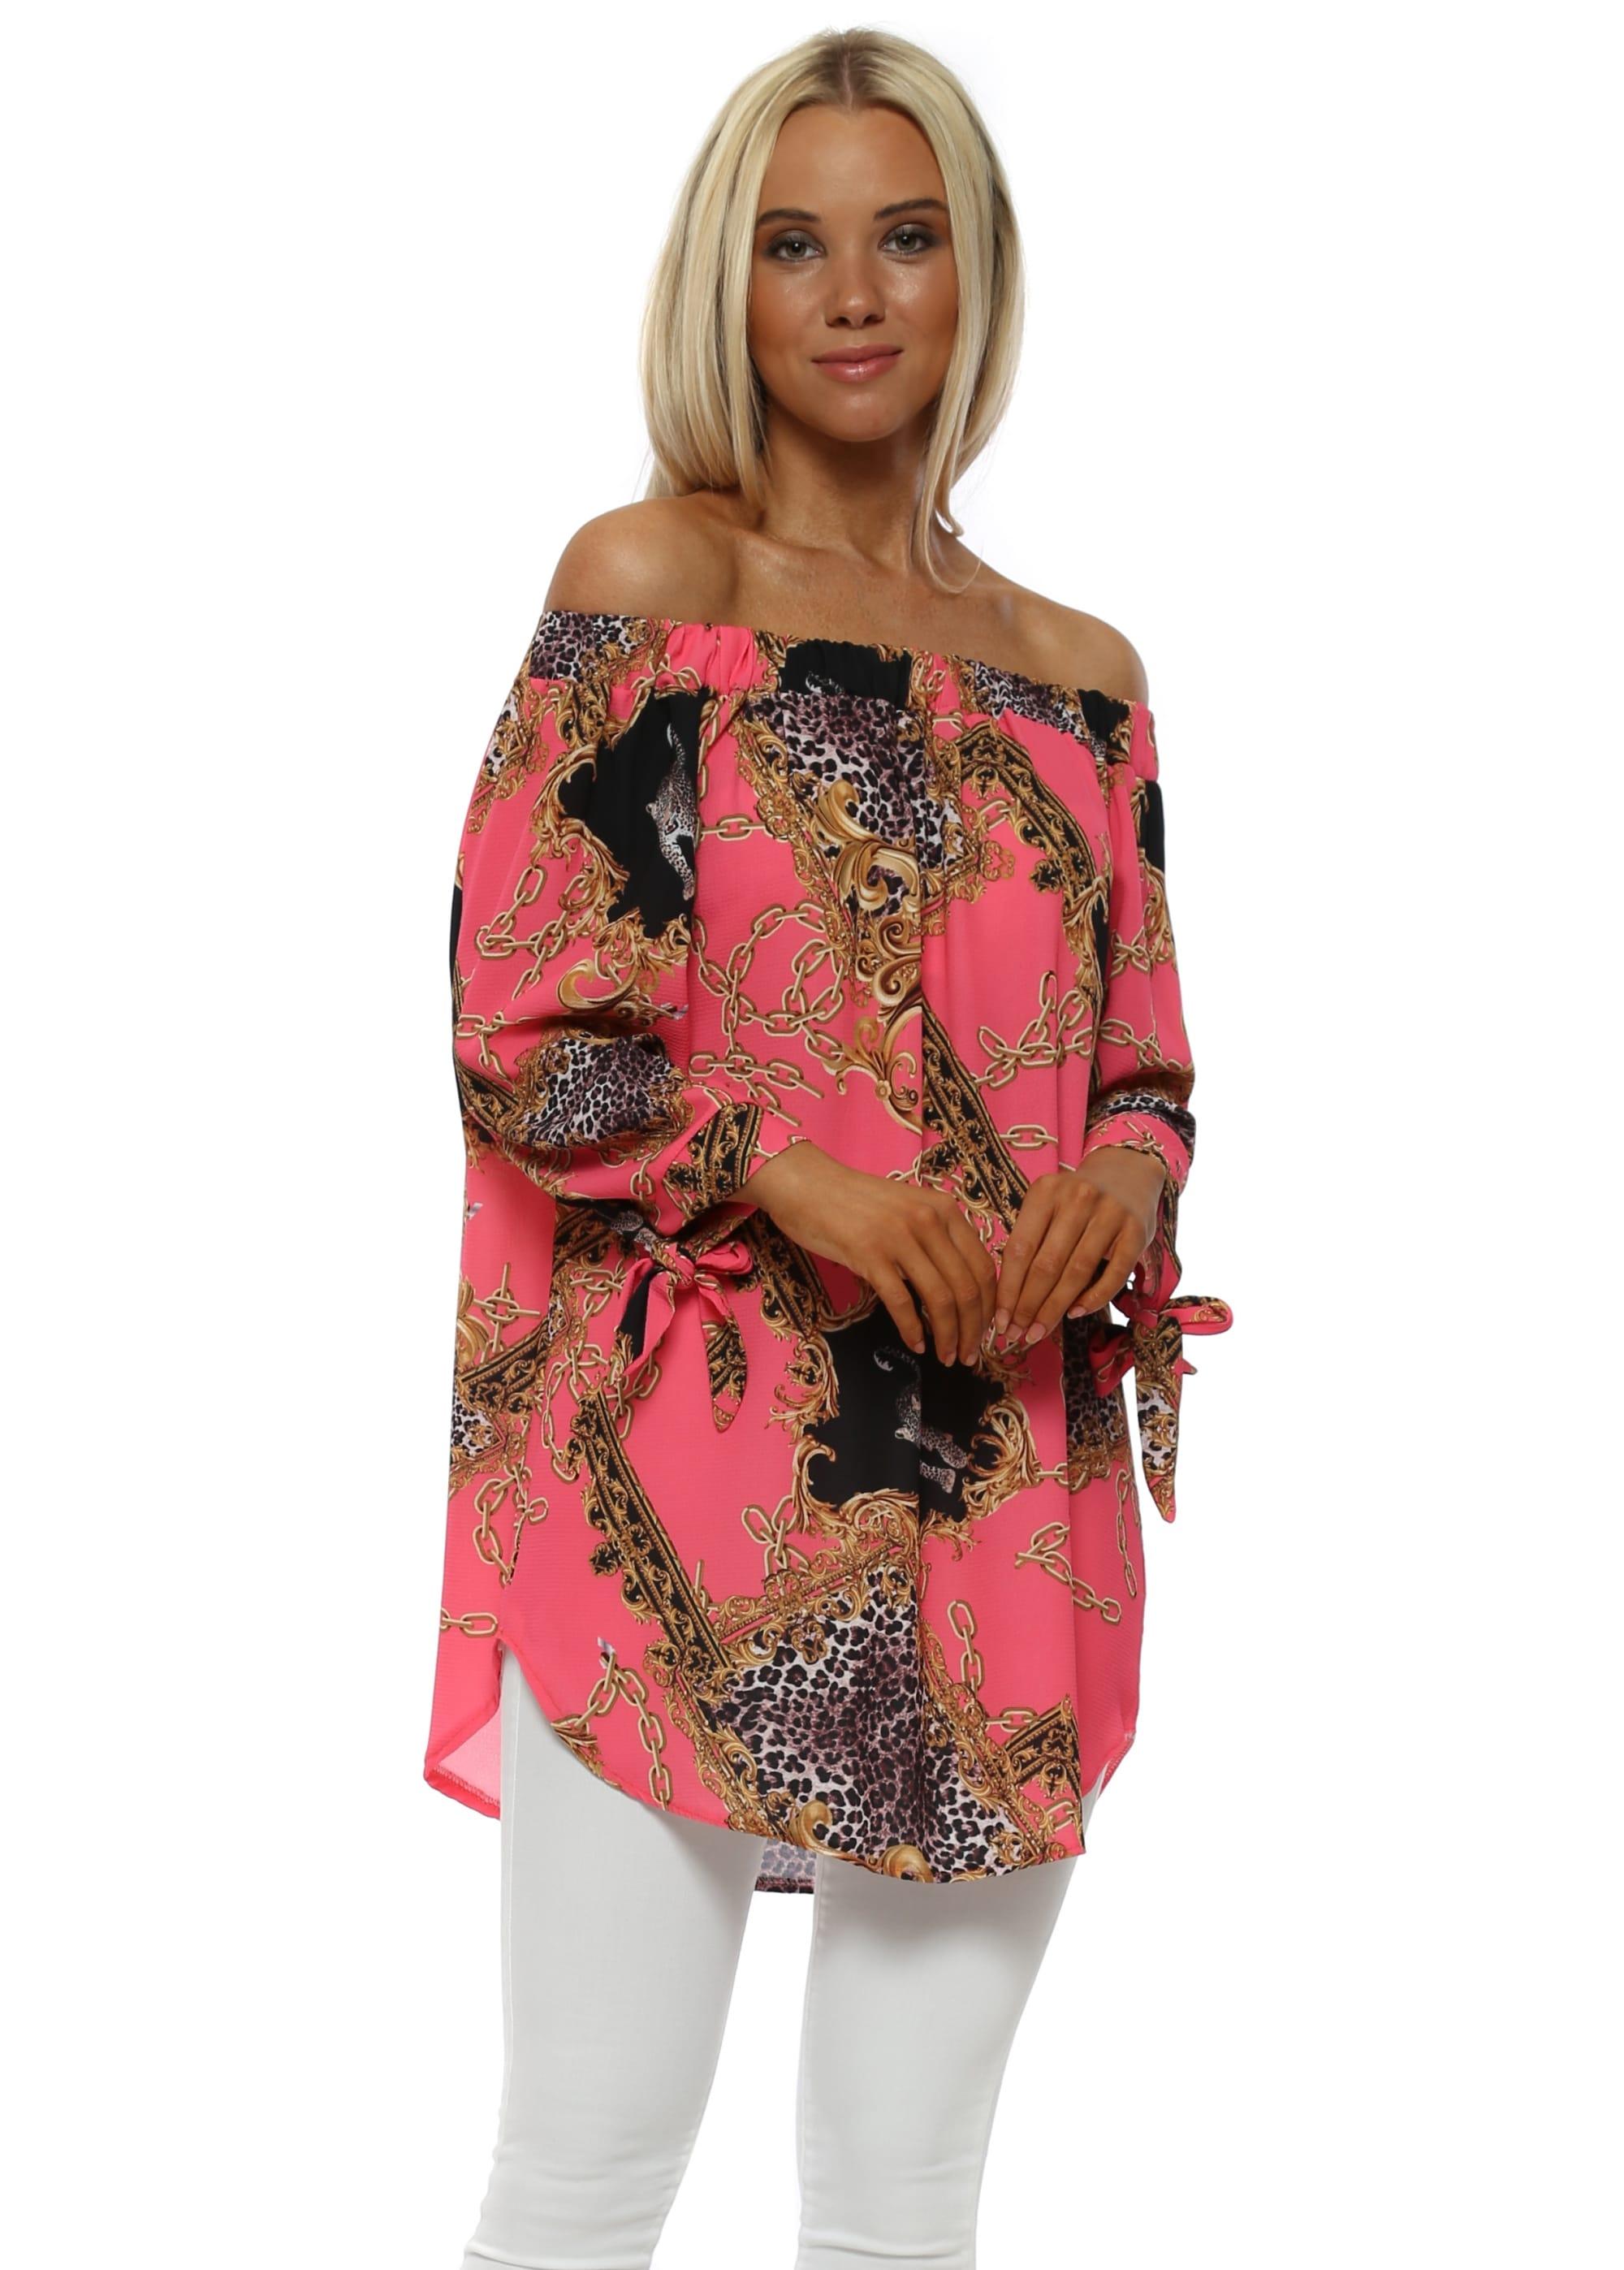 a2ab9405401 Gold Chain & Leopard Print Hot Pink Bardot Top